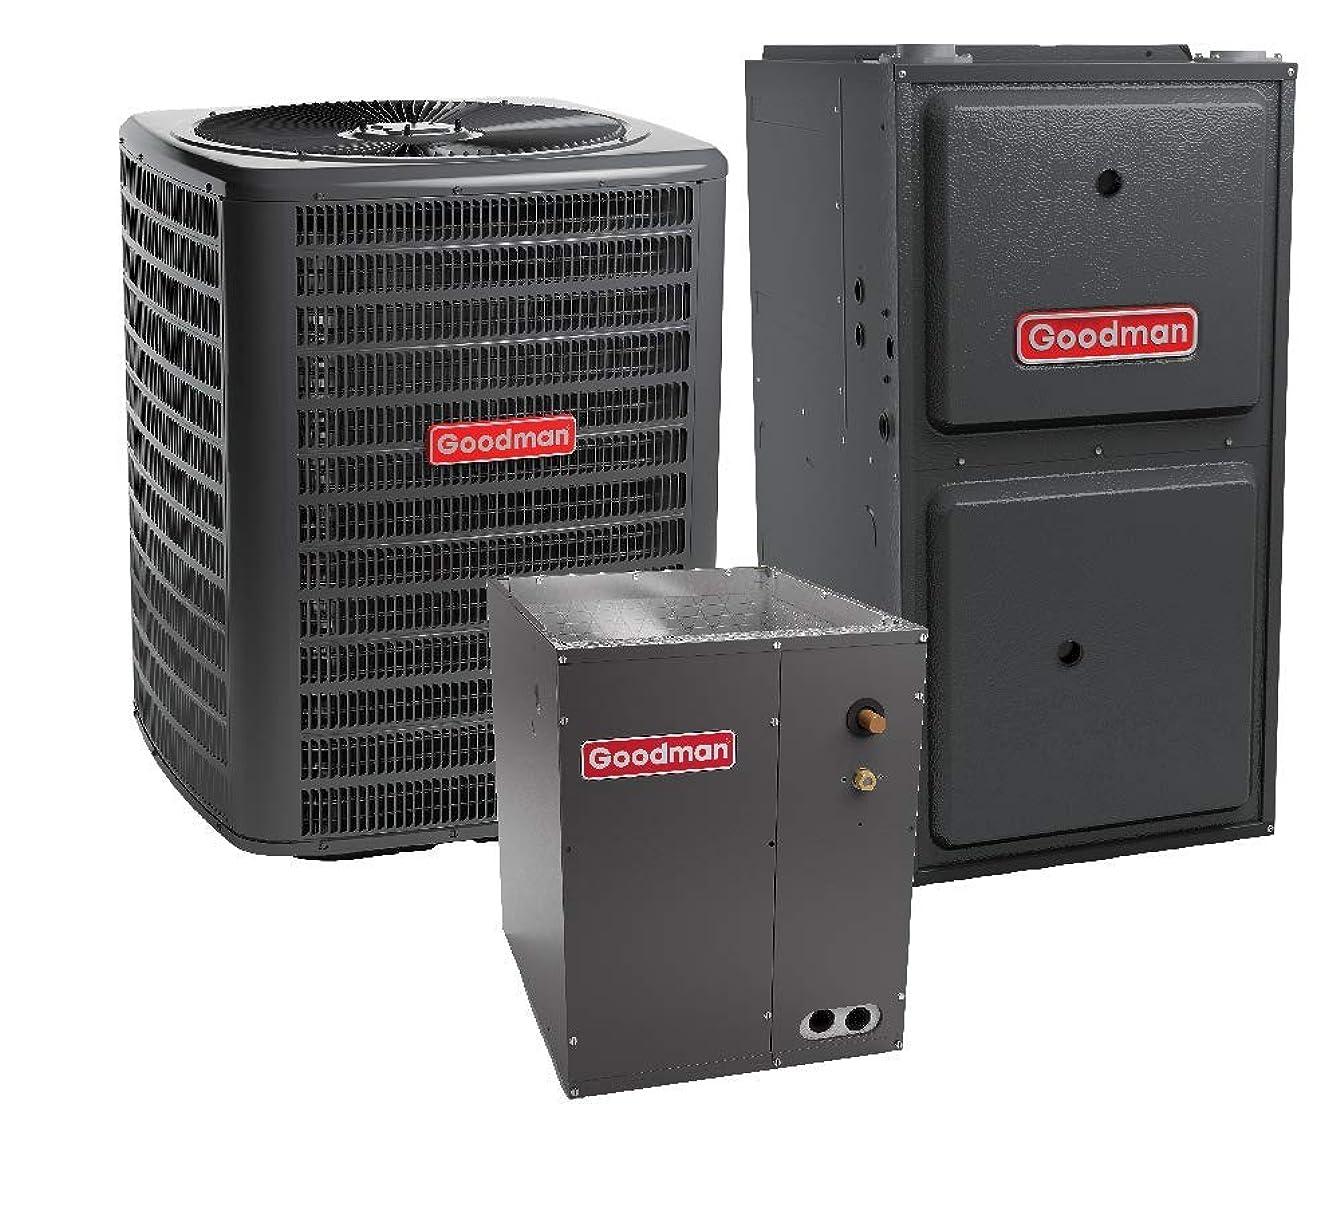 Goodman 2.5 Ton 14 SEER Air Conditioner GSX160301, Coil CAPF3137B6, 40,000 BTU 92% AFUE Downflow Gas Furnace GCSS920402BN